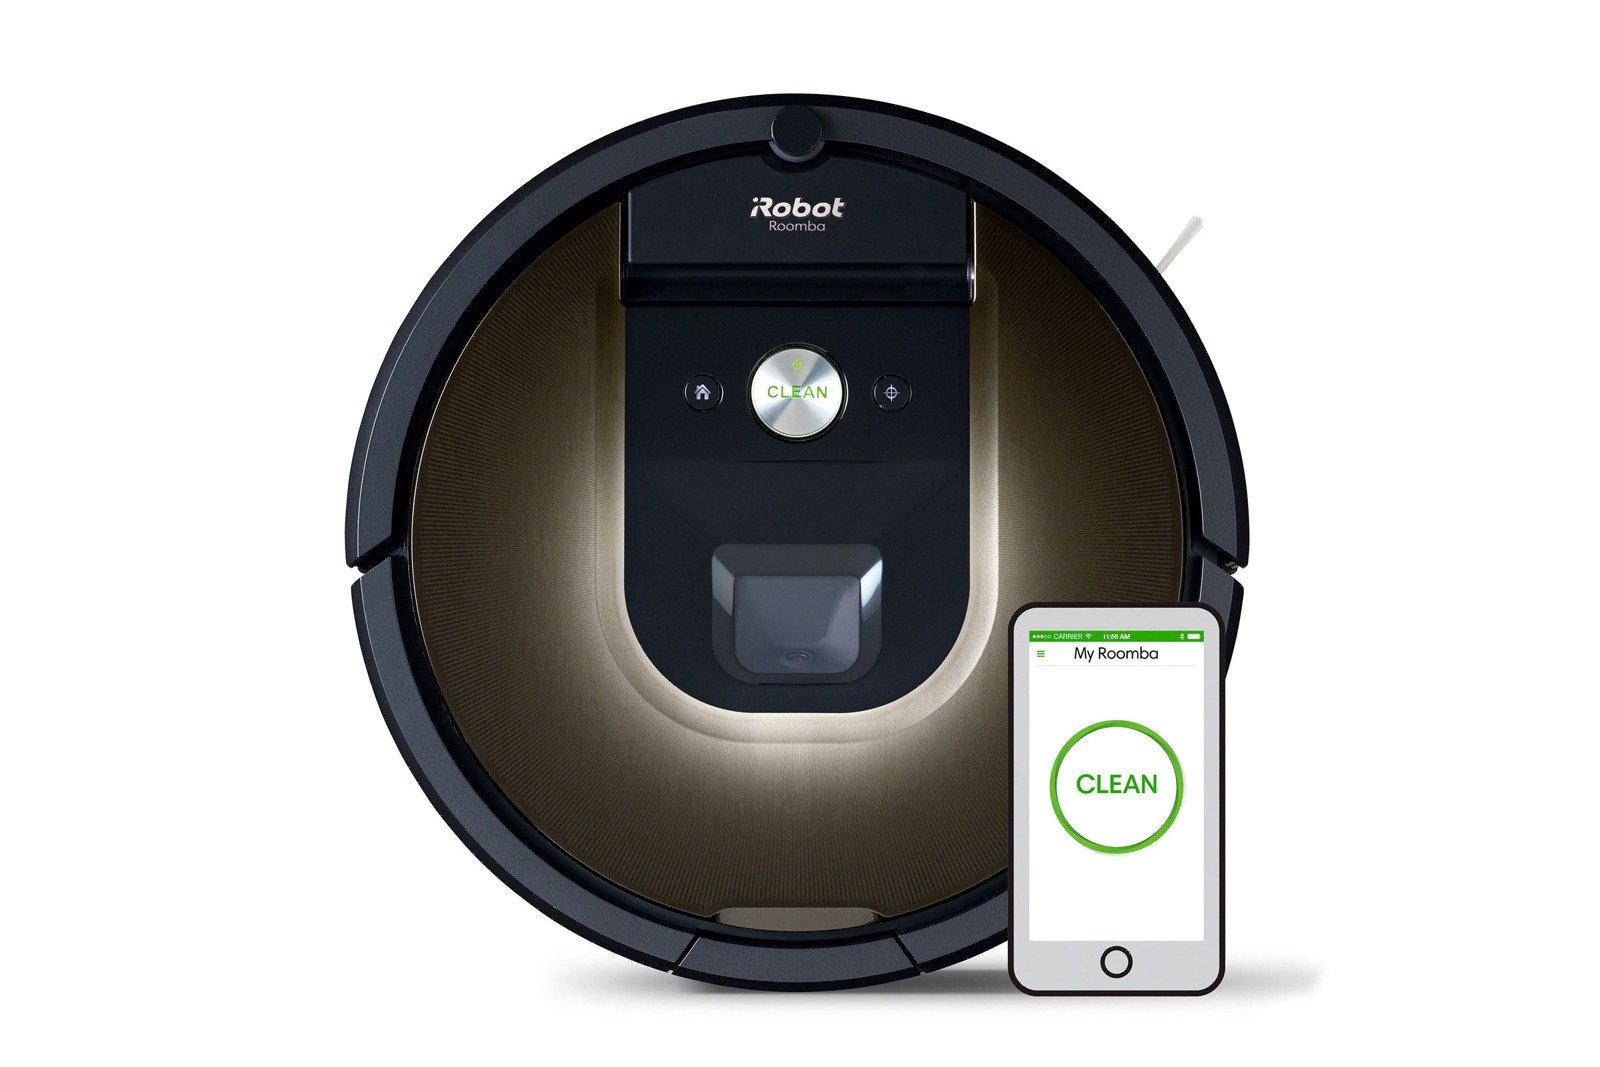 iRobot Roomba 980 Wi-Fi Connected Robot Vacuum